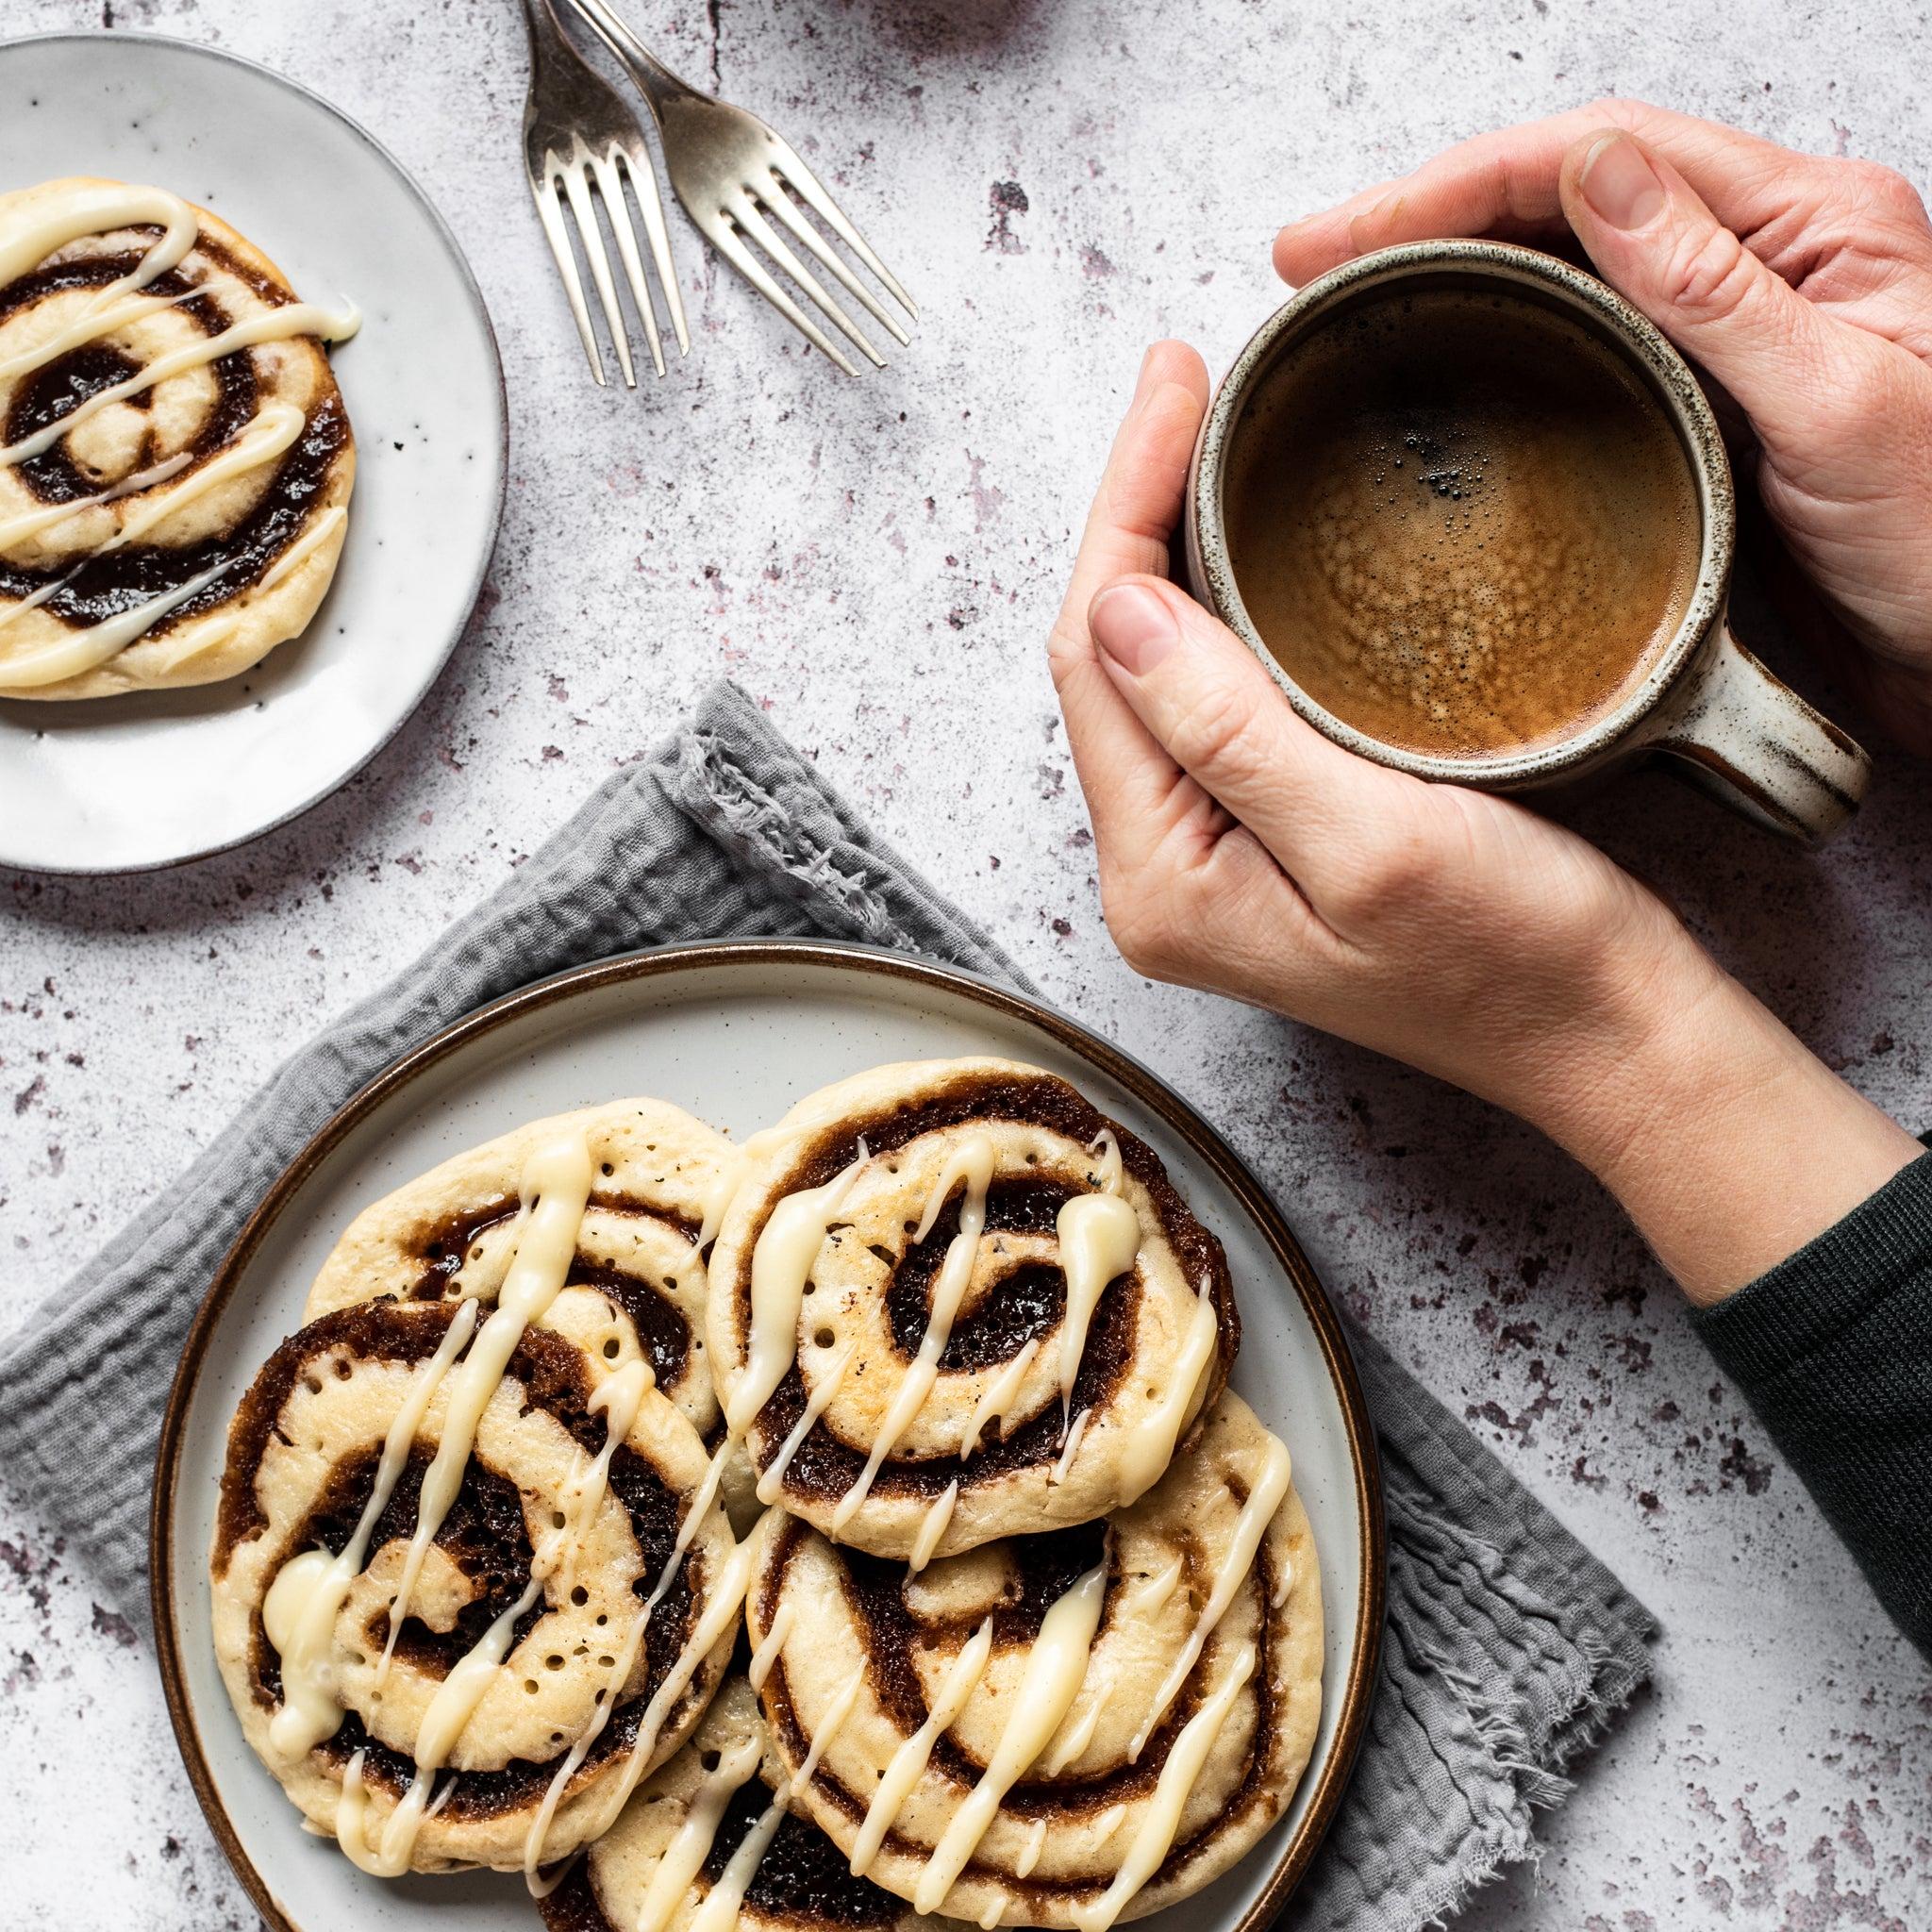 Cinnamon-Swirl-Pancakes-SQUARE-4.jpg